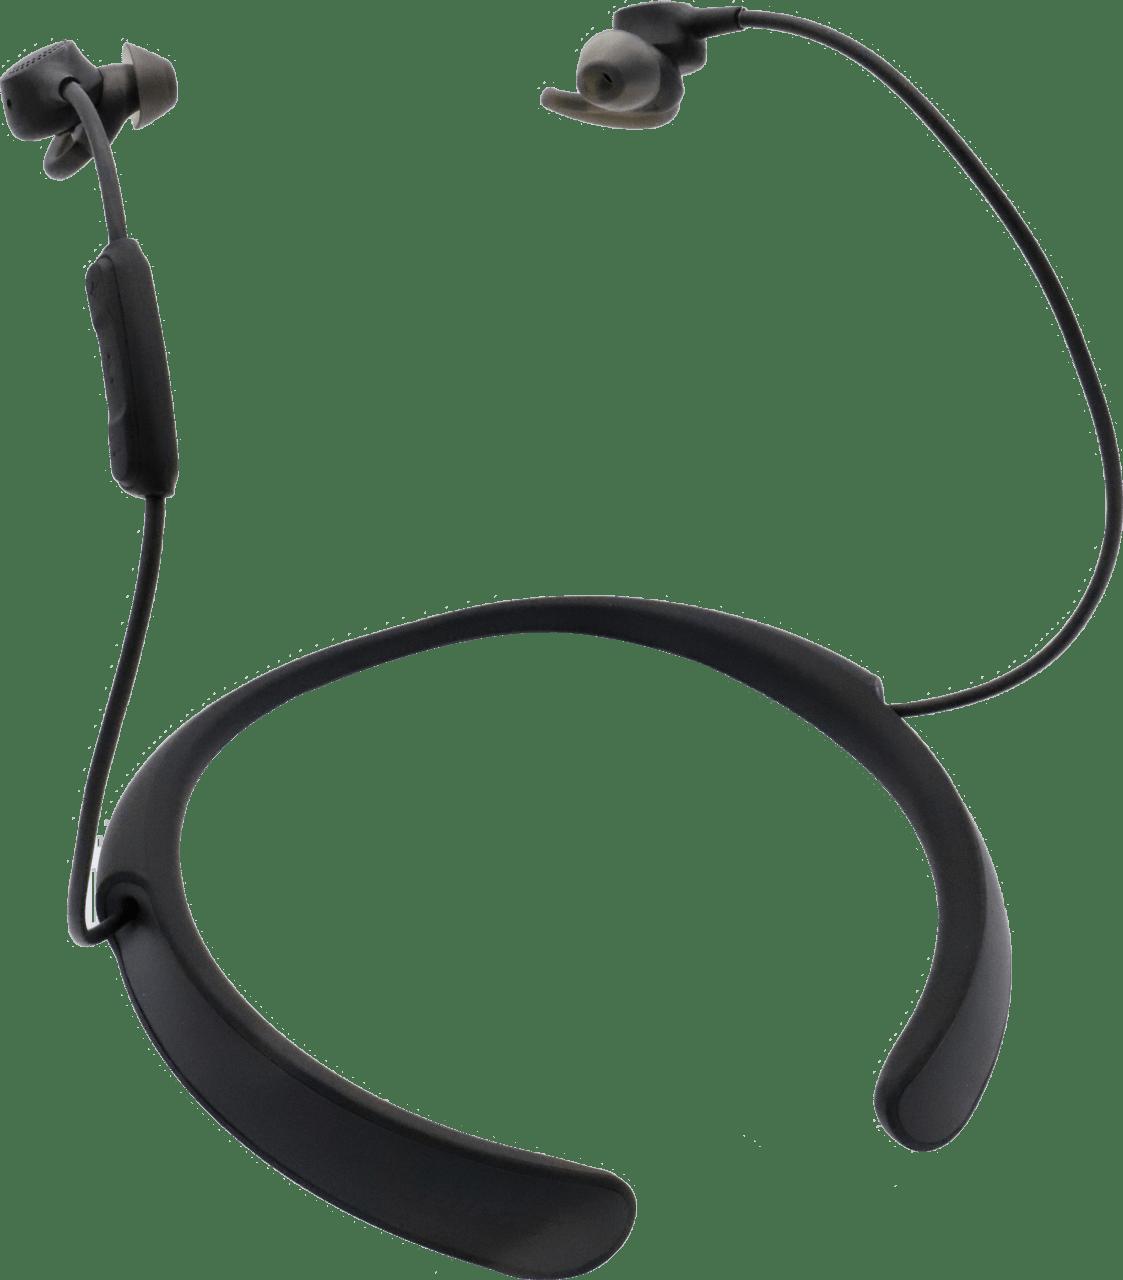 Black BOSE QuietControl 30 Wireless, In-Ear Headphones.1